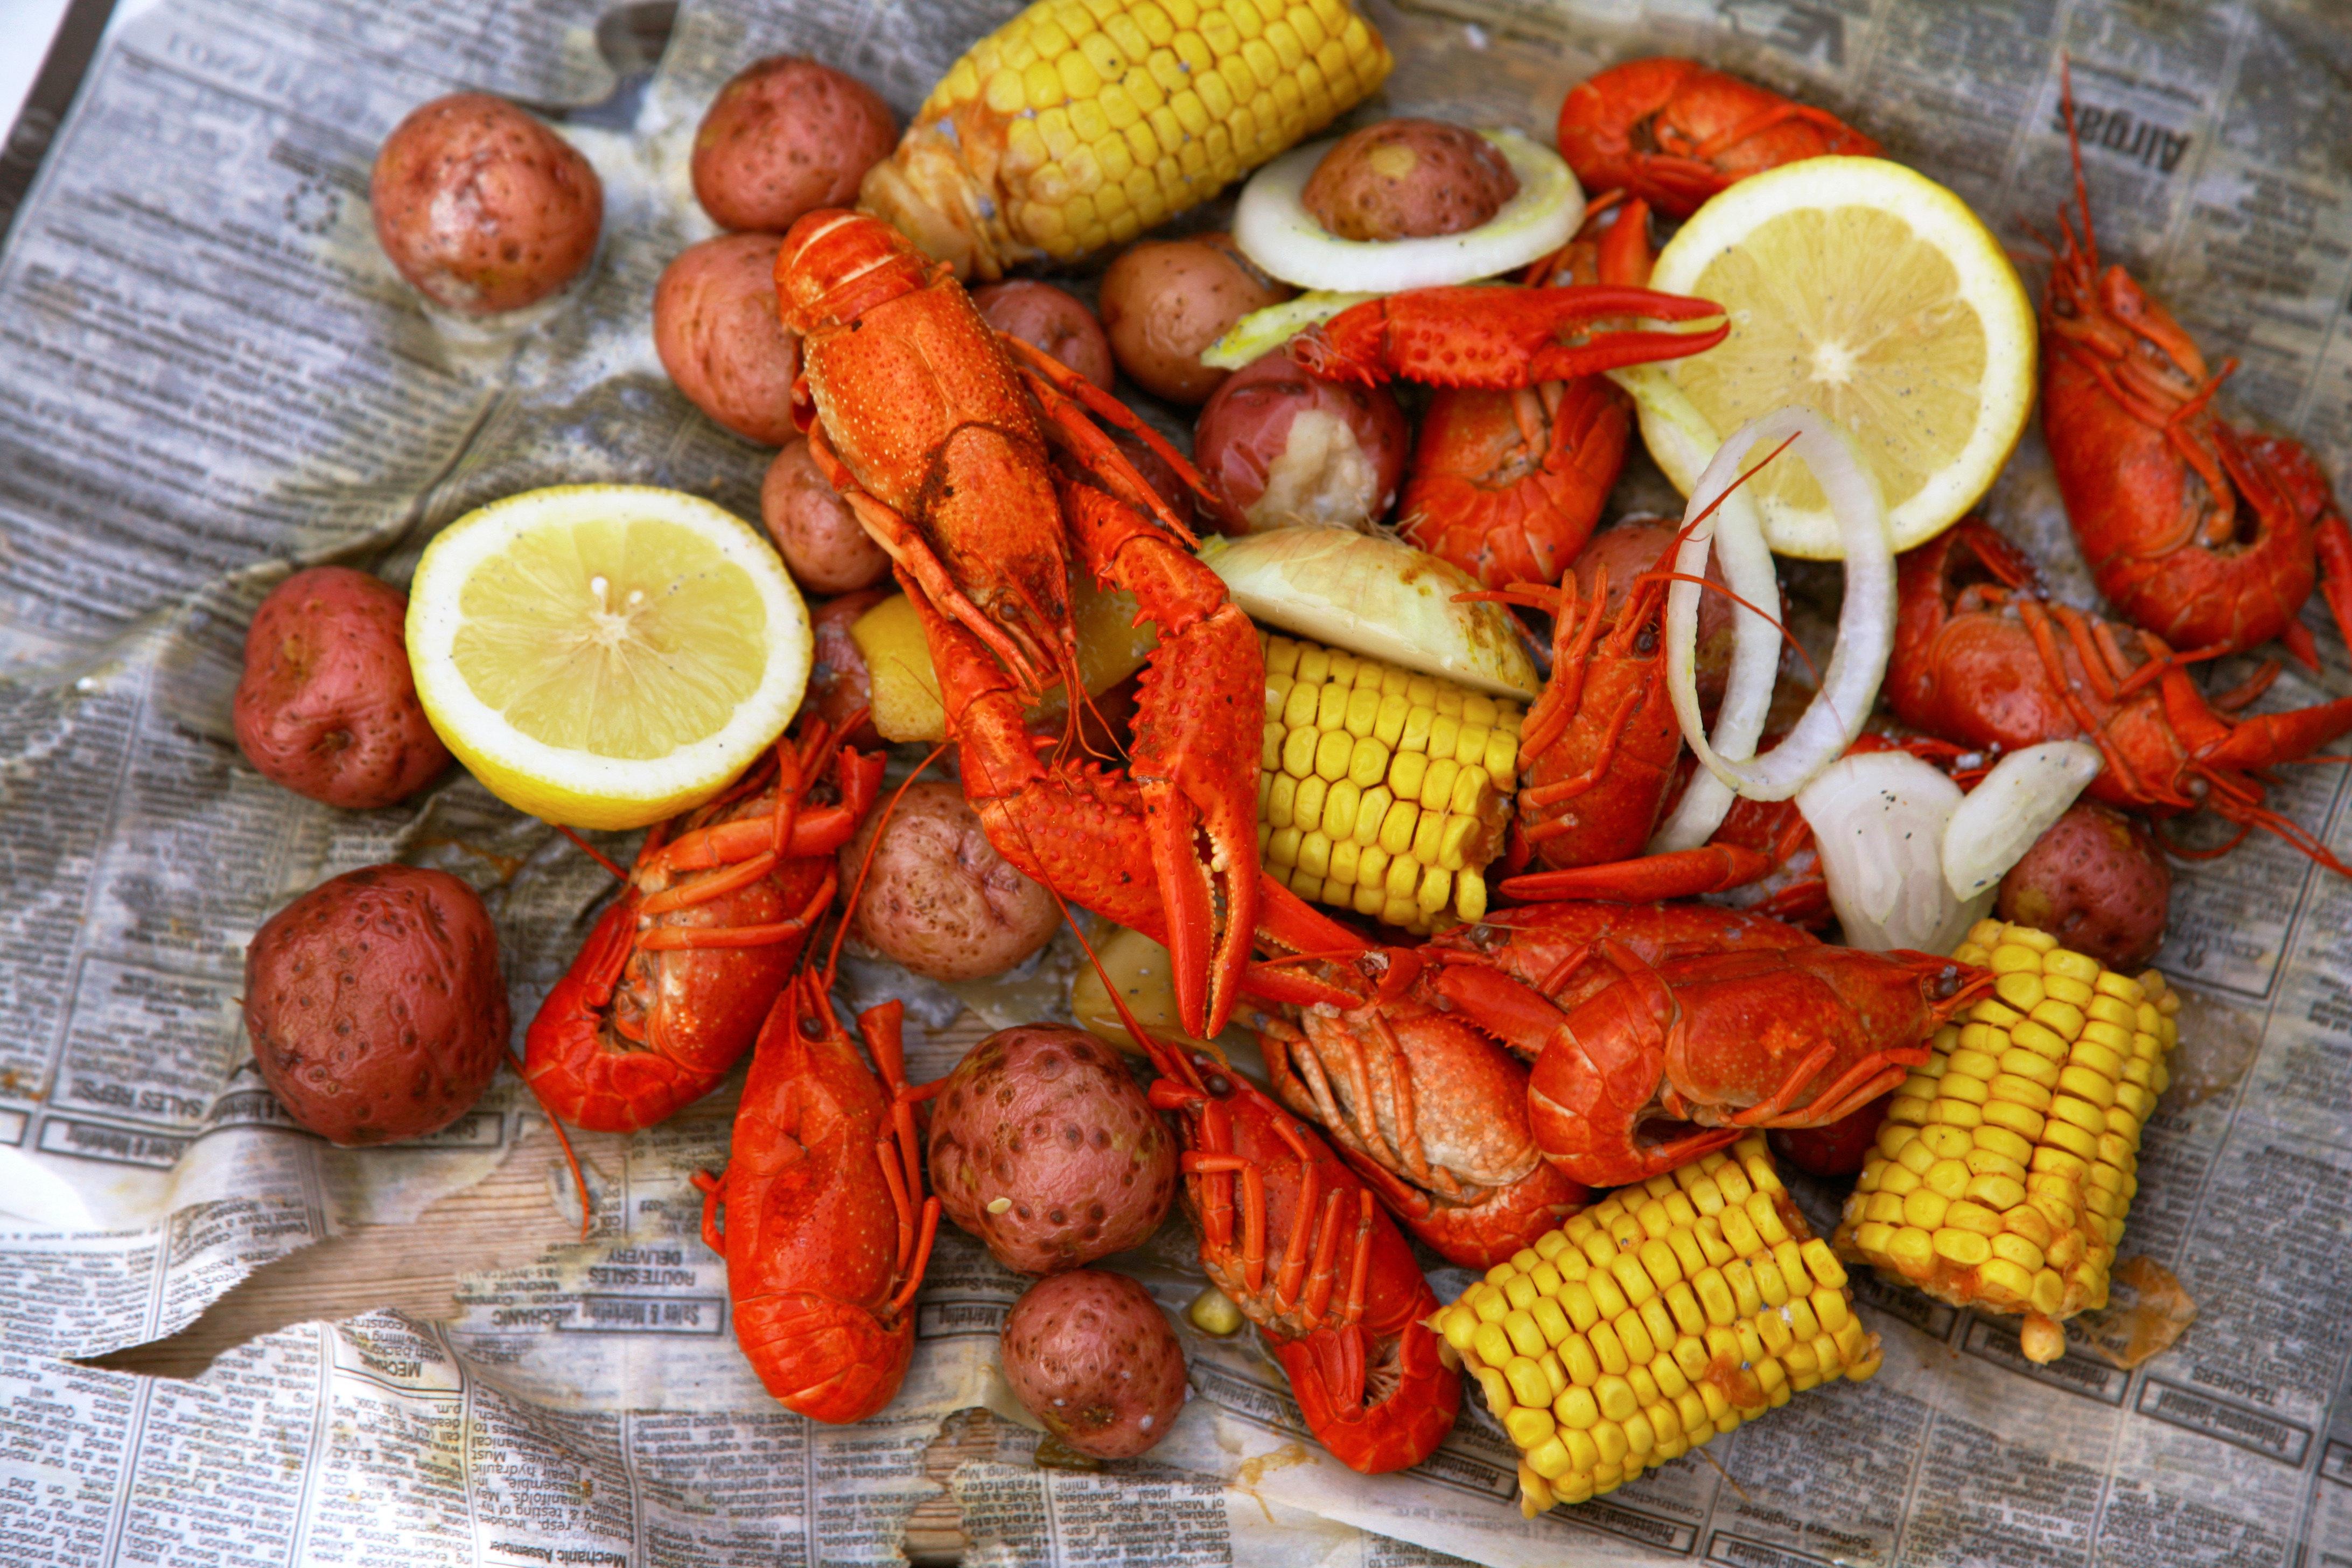 Business City Cultural Dining Drink Nightlife food seafood boil vegetable fish Seafood cuisine sliced fresh